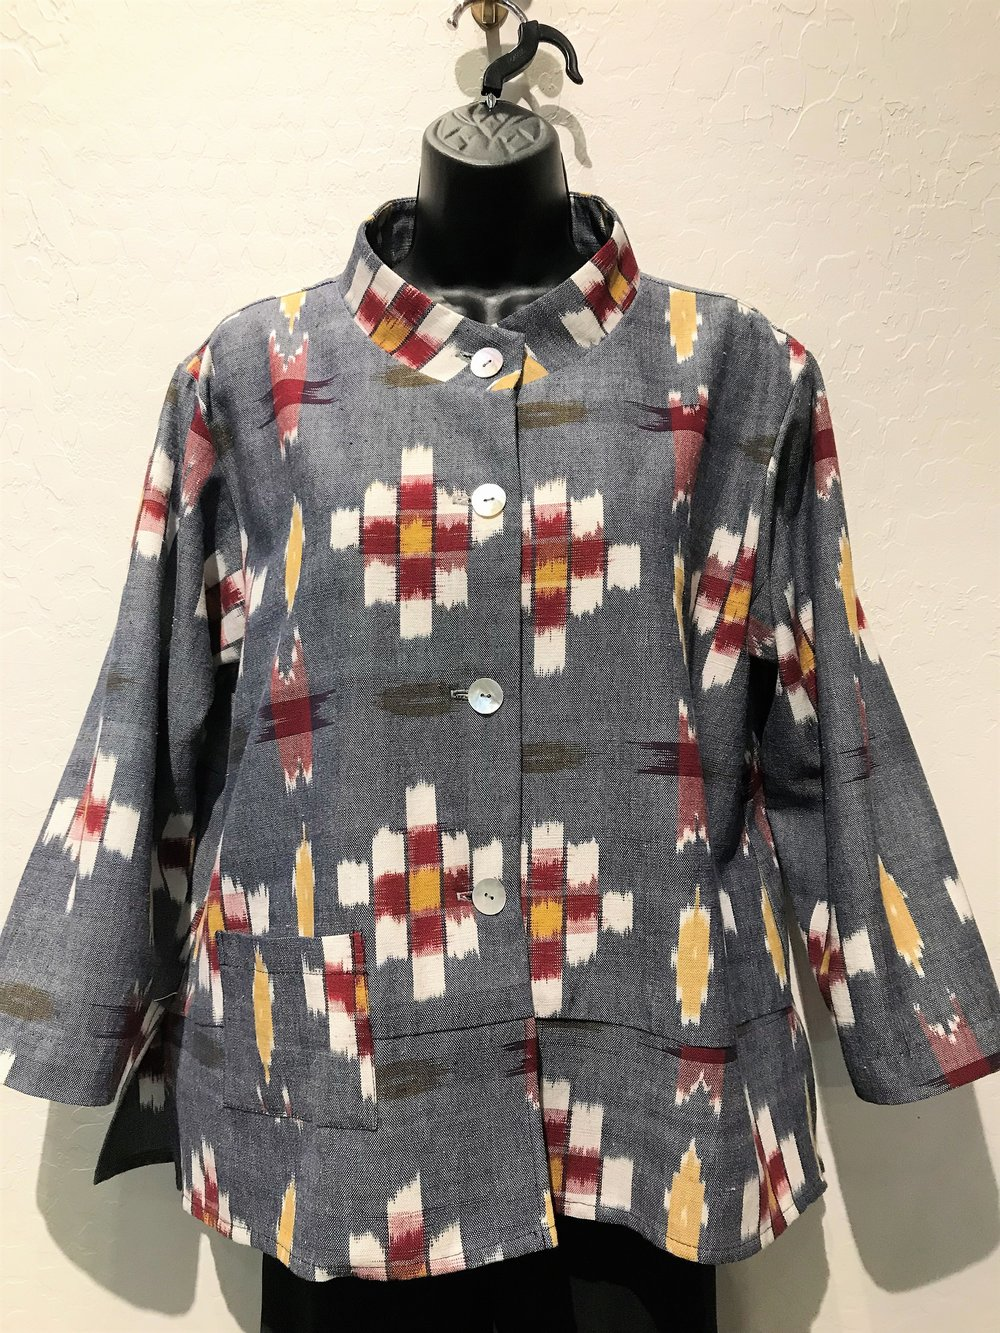 Stand Collar Jacket - Kasuri Textile